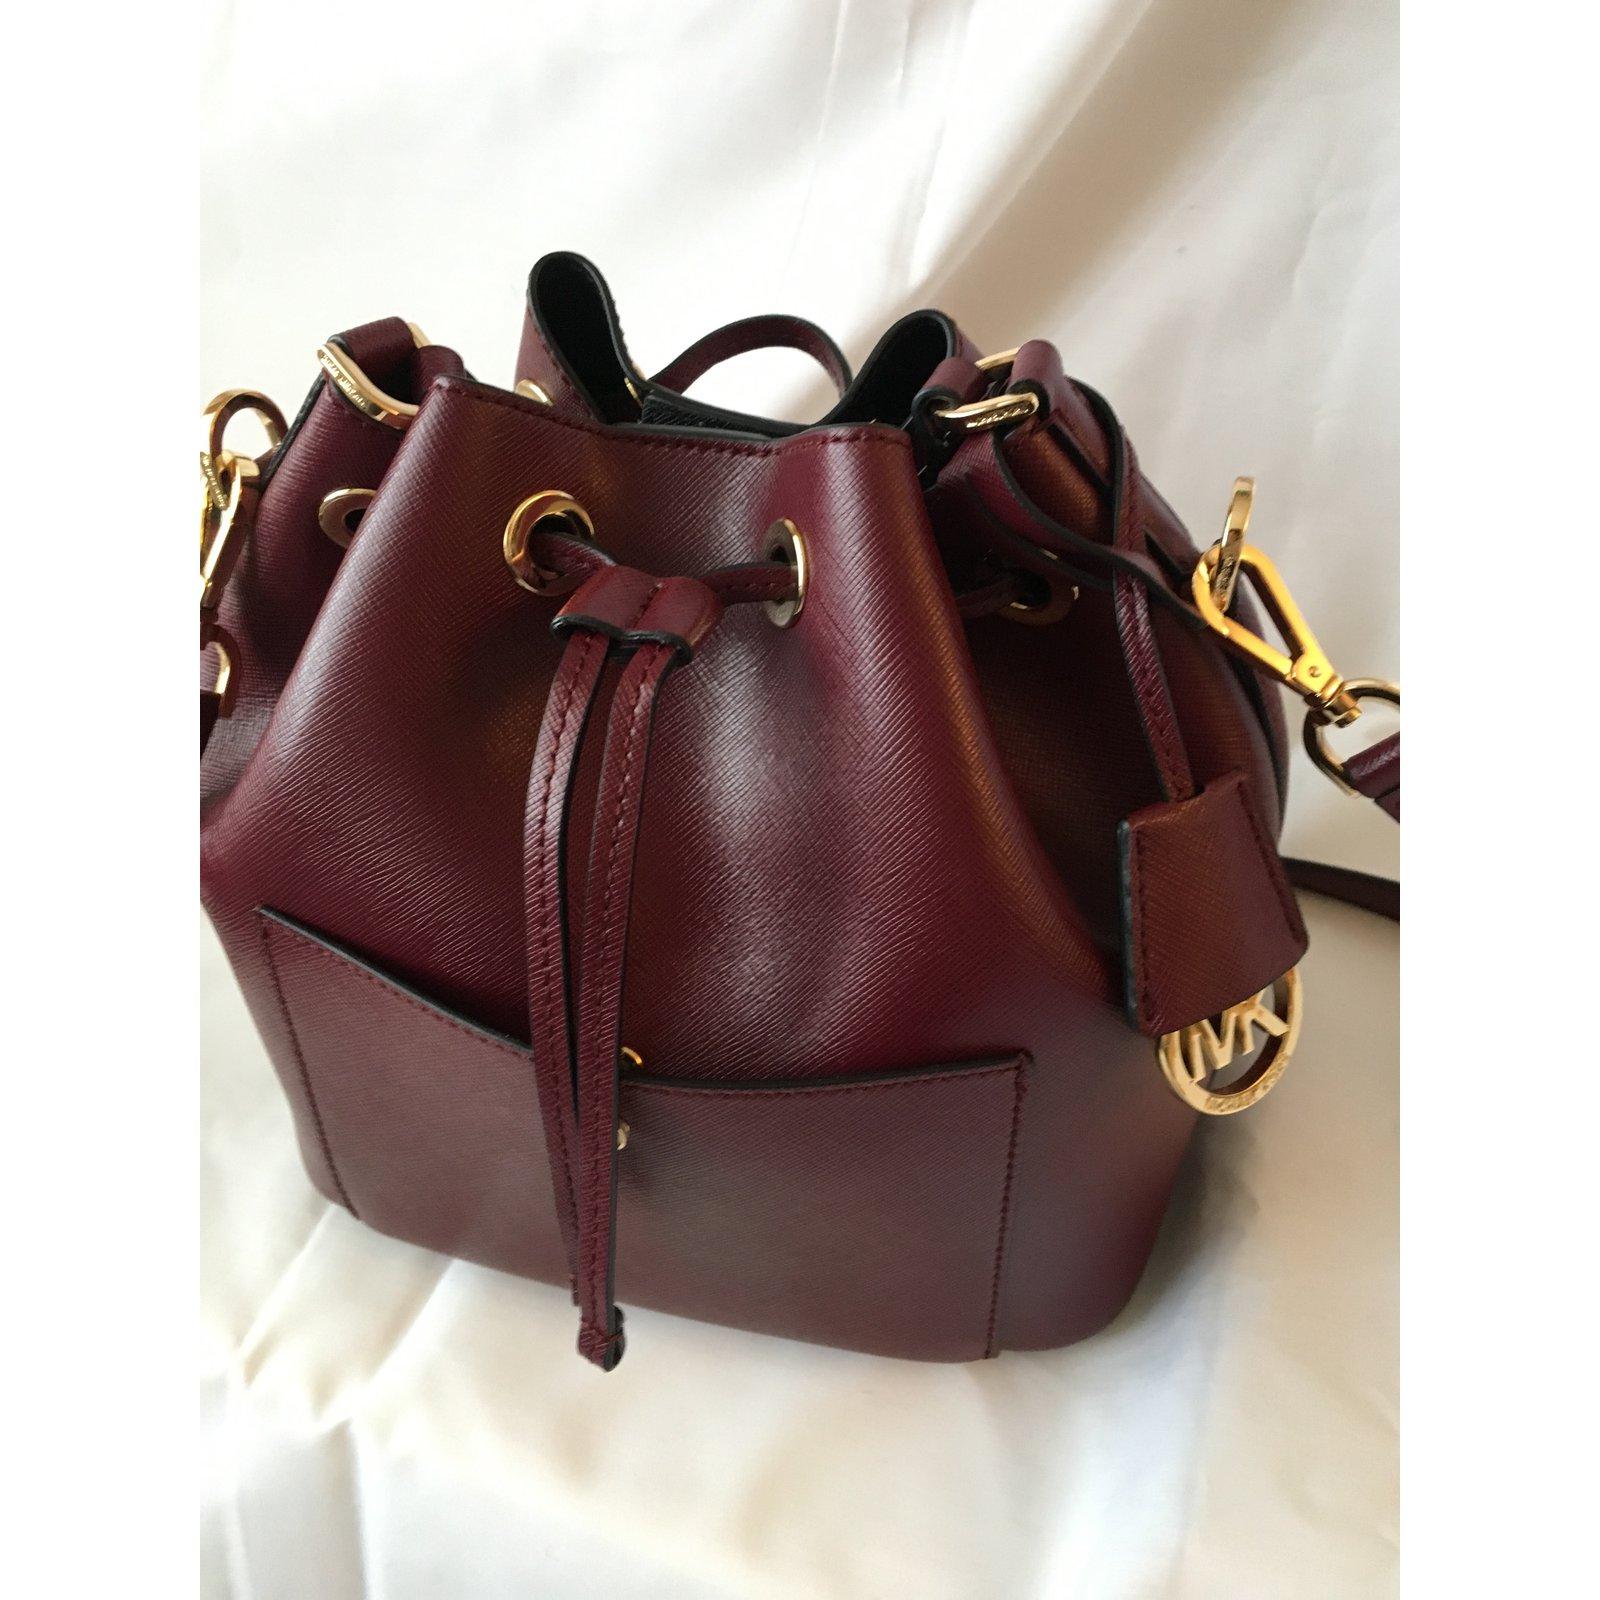 Michael Kors Greenwich Md Bucket Handbags Leather Dark Red Ref54483 Bag Authentic Joli Closet